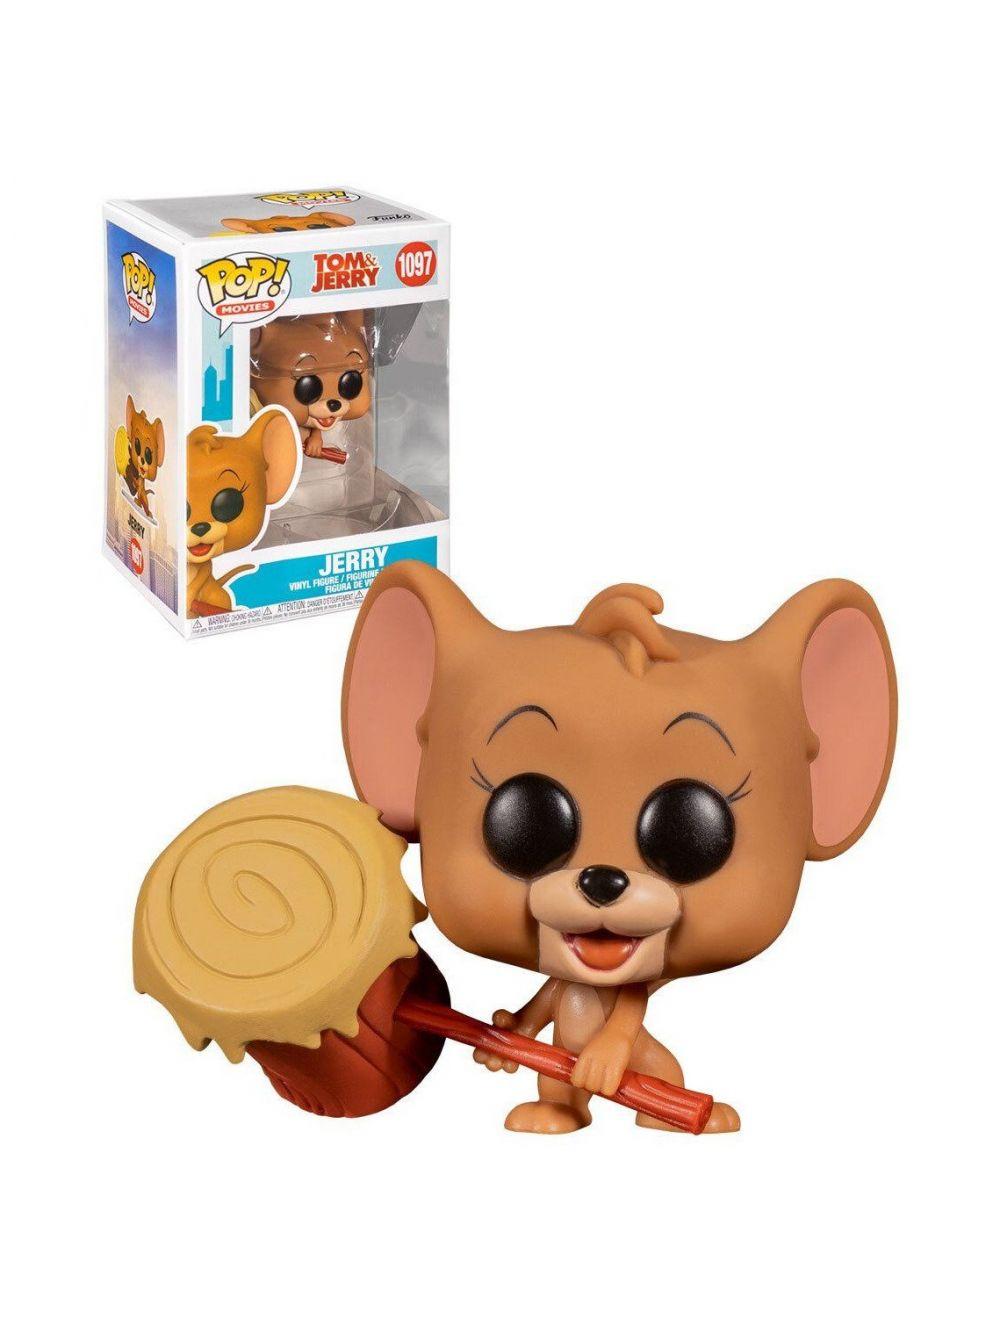 Funko POP! Movies: Tom & Jerry - Jerry Vinyl Figura 10cm